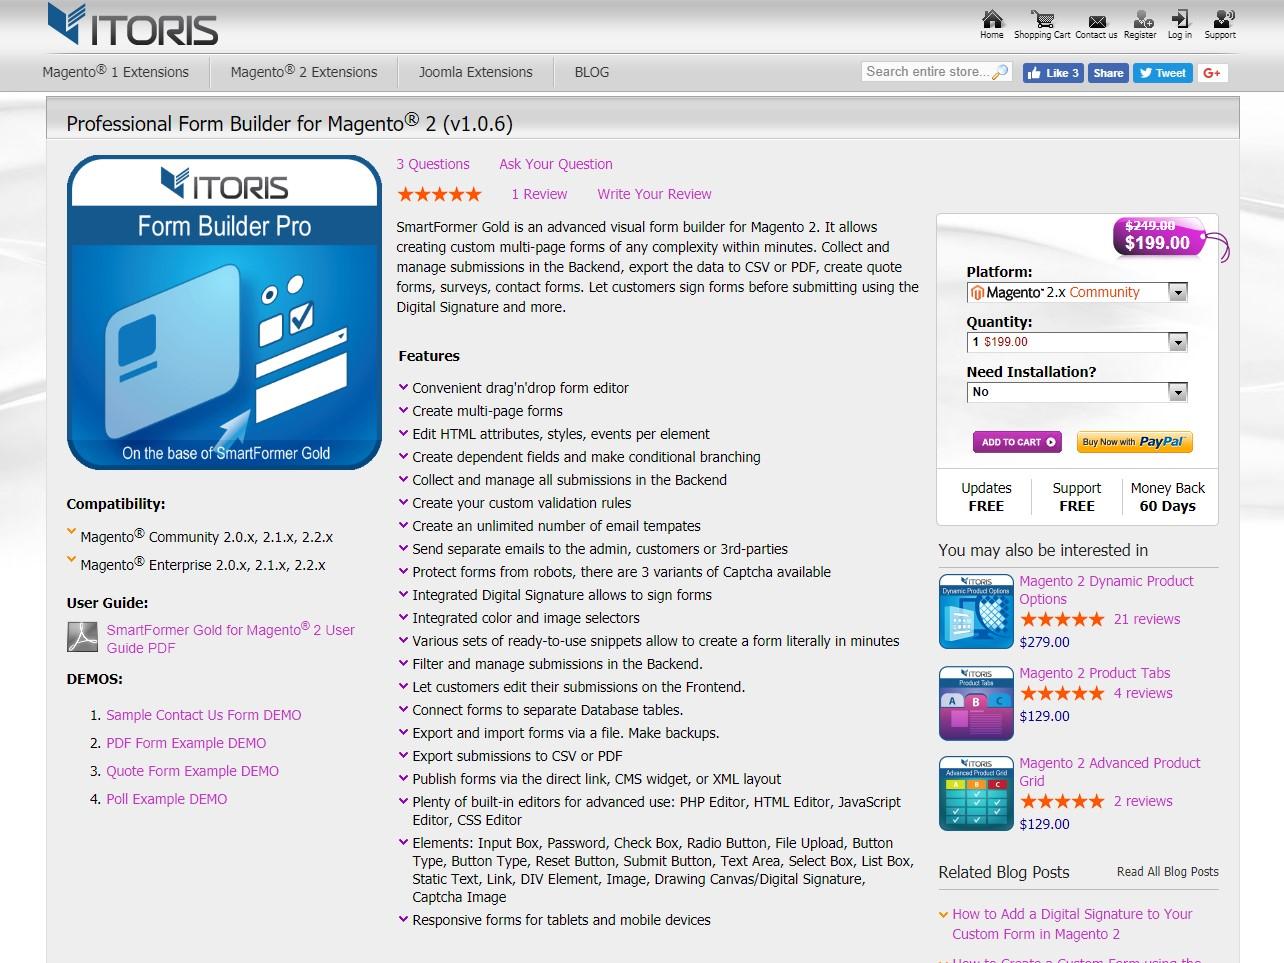 Professional Form Builder for Magento 2 - Itoris